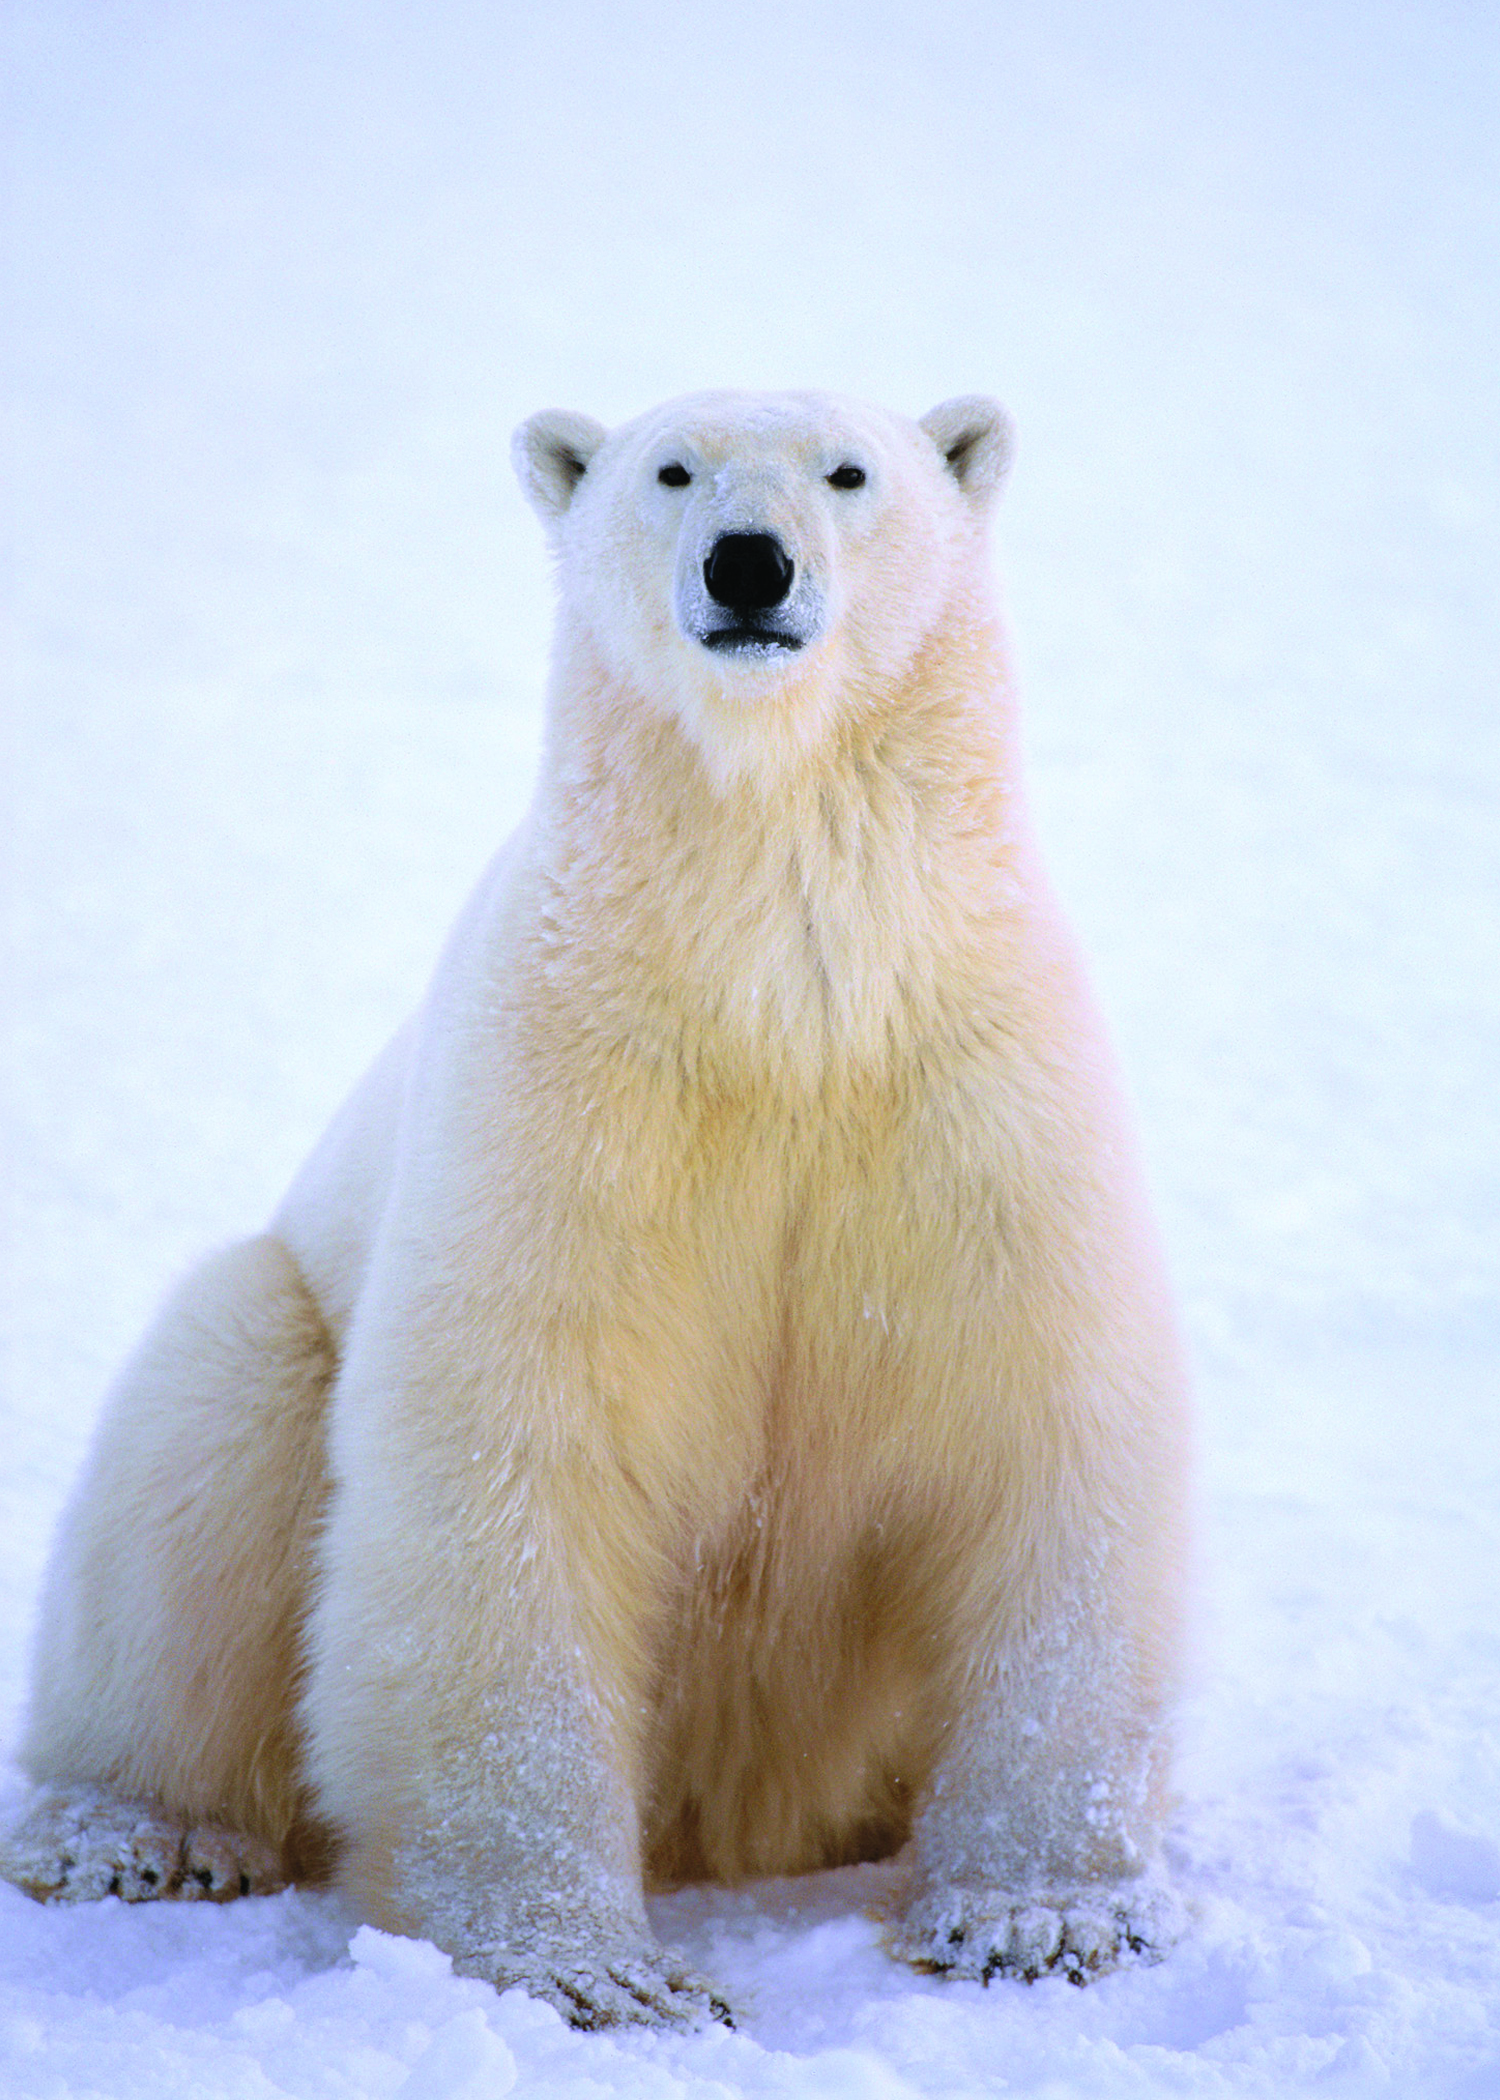 Polar Bear Fotolip Com Rich Image And Wallpaper